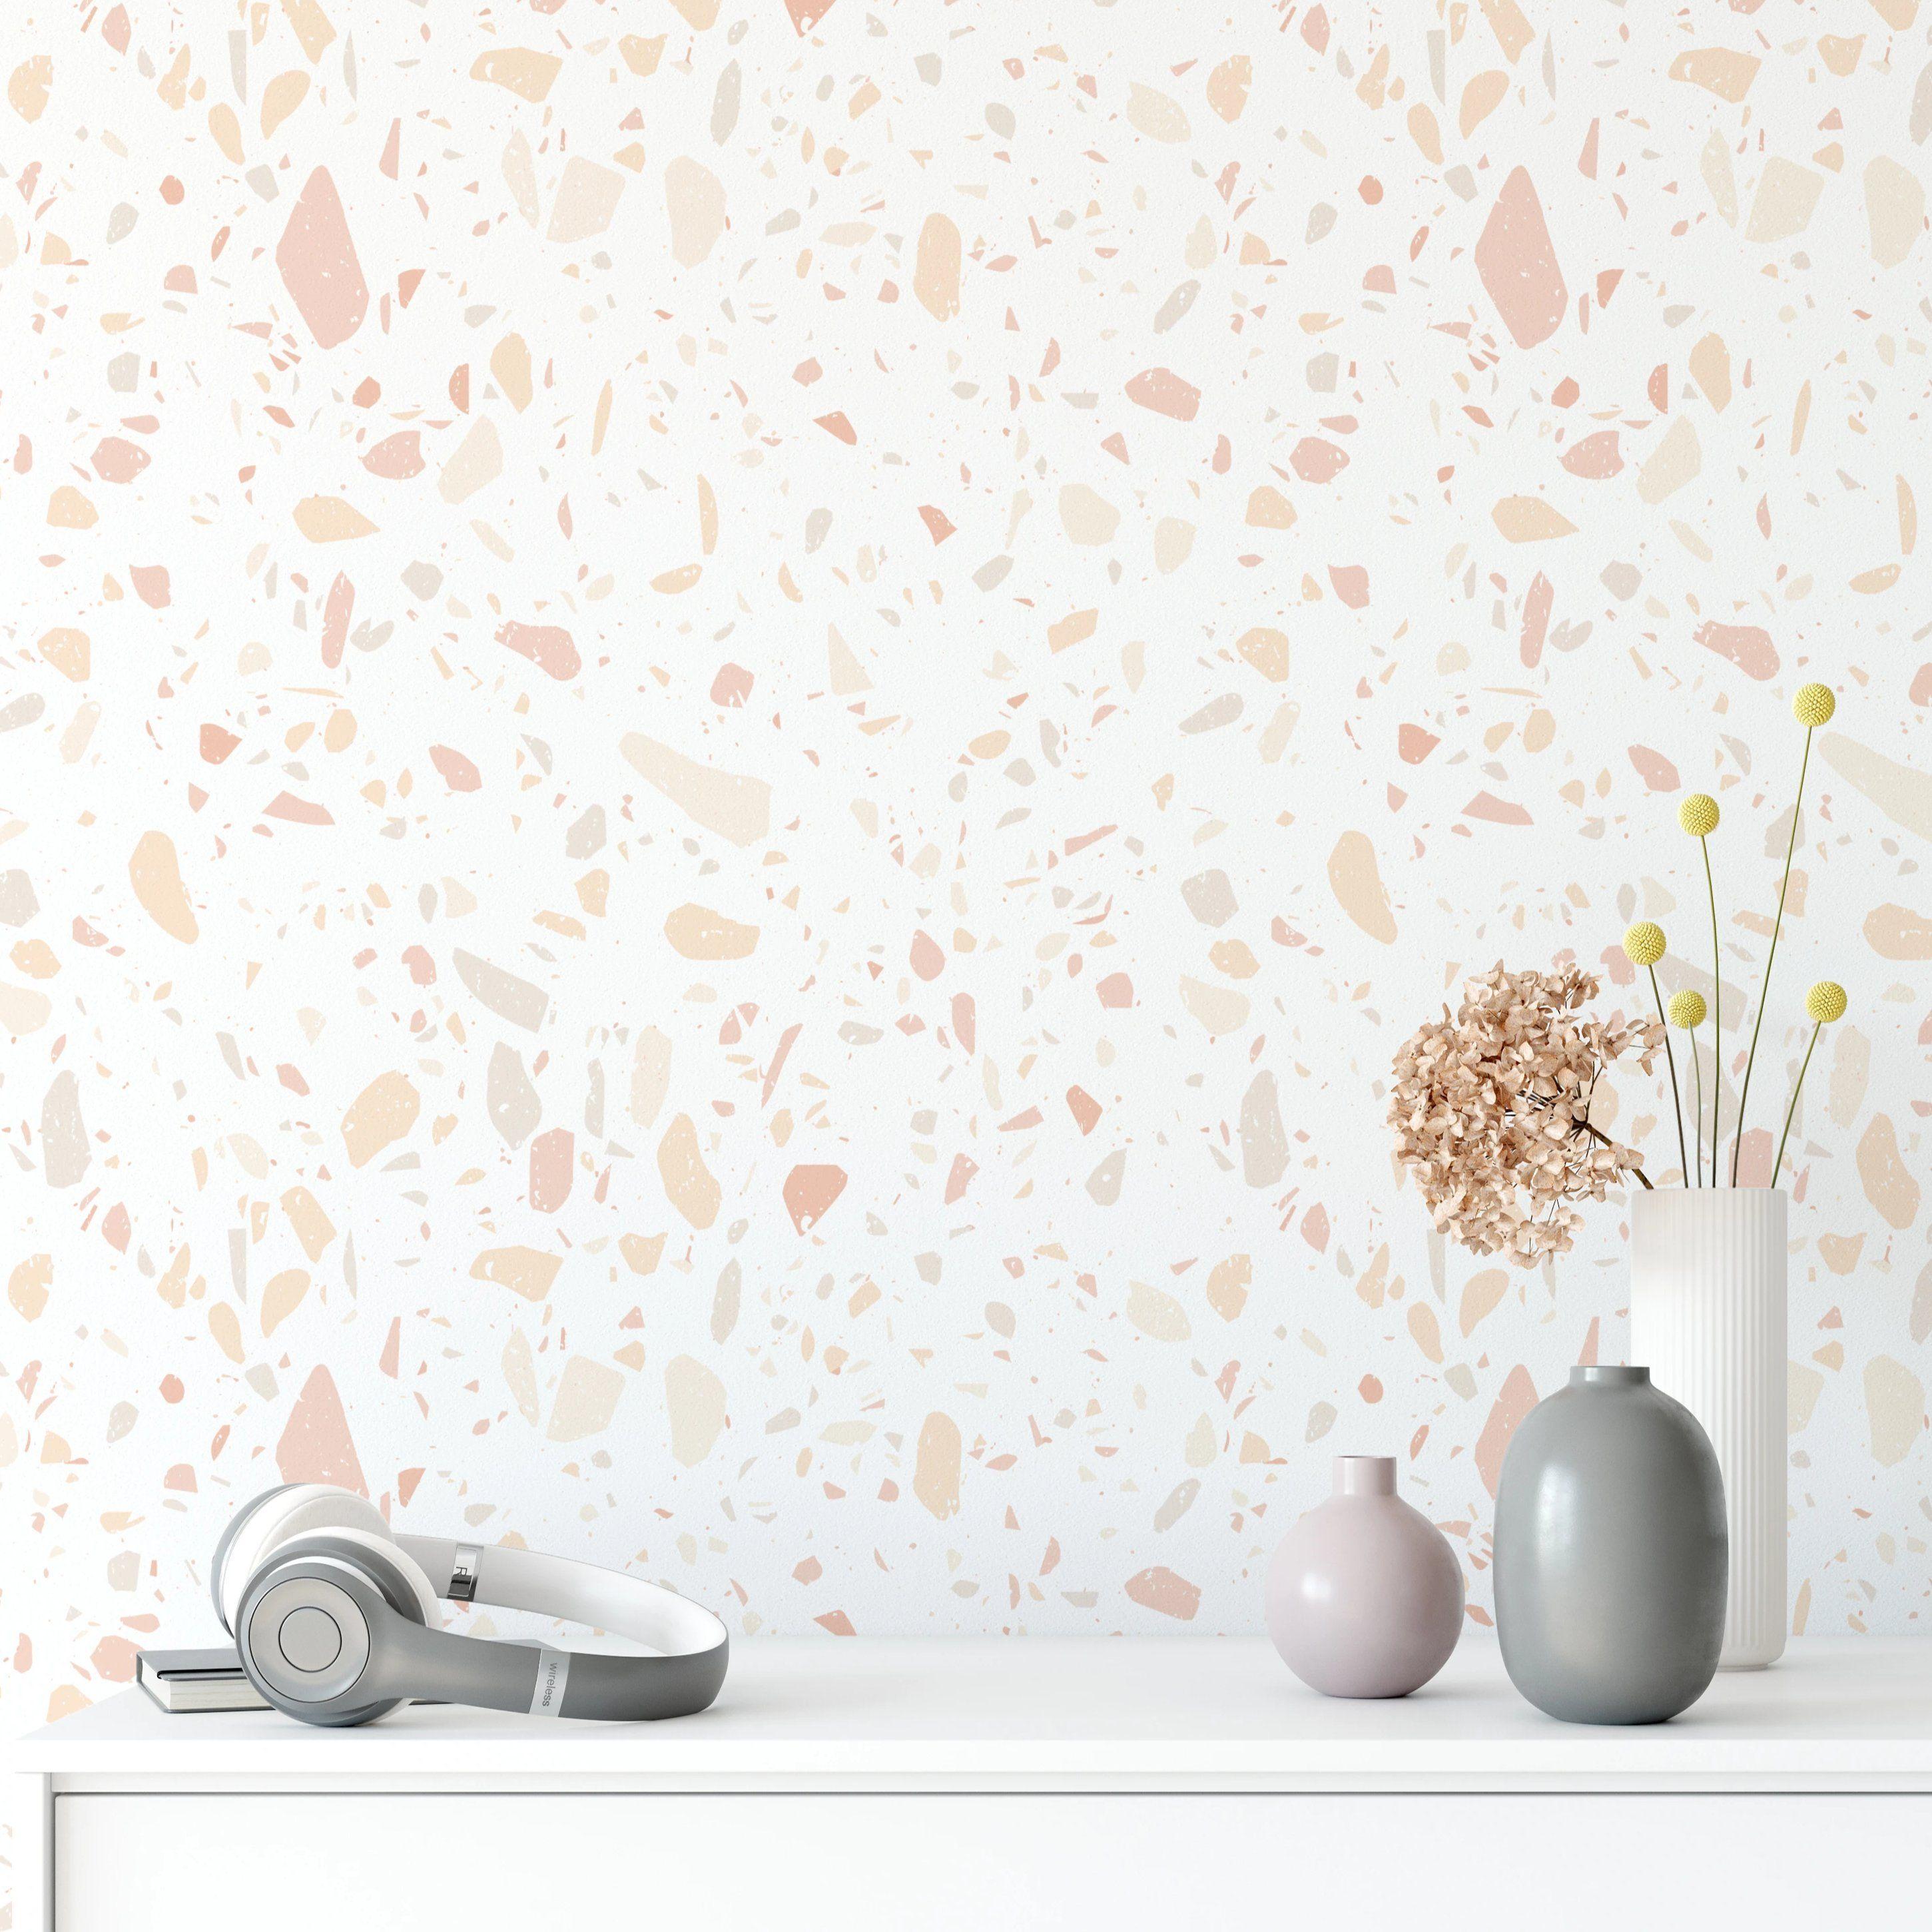 Terrazzo Wallpaper Peel And Stick Wallpaper Removable And Self Adhesive Premium Home Decor Timberleawallpaper Peel And Stick Wallpaper Terrazzo Wallpaper